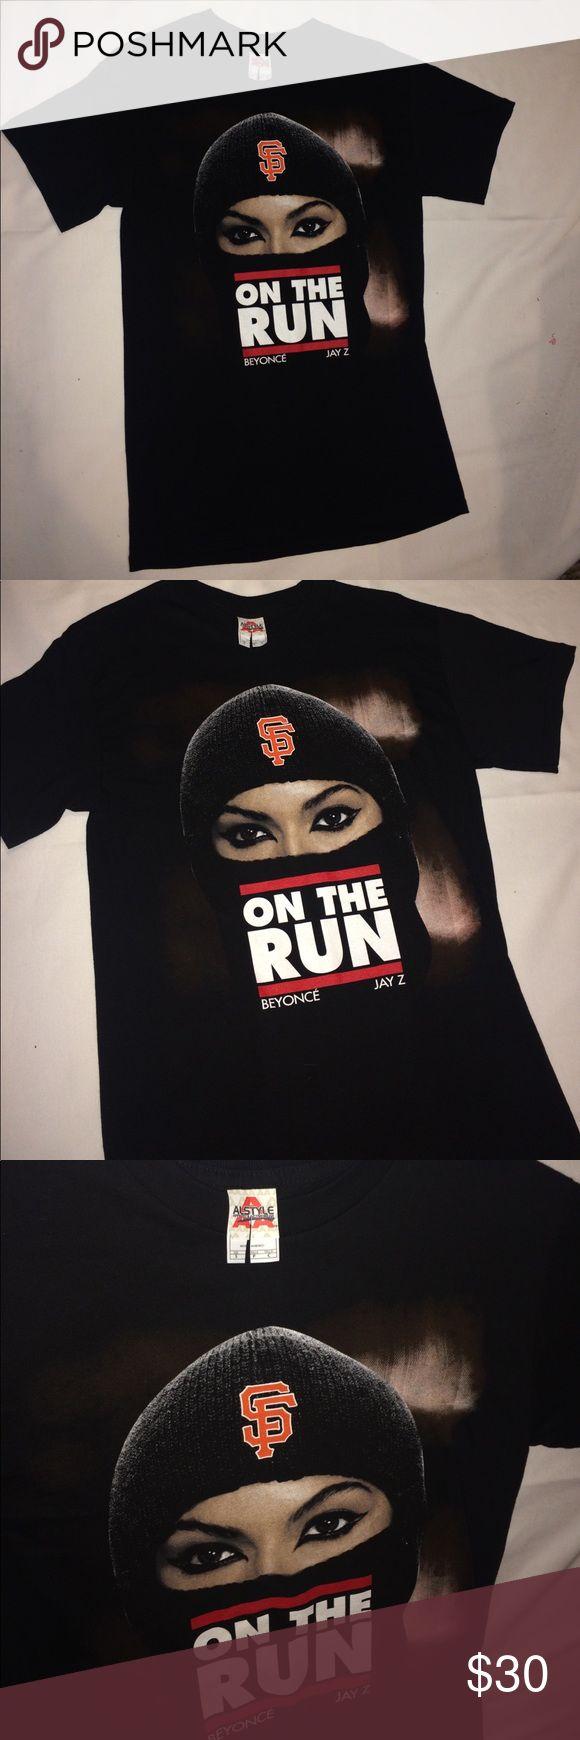 Jay z Beyoncé tshirt on the run tour small Brand new San Francisco stop of tour concert Tops Tees - Short Sleeve